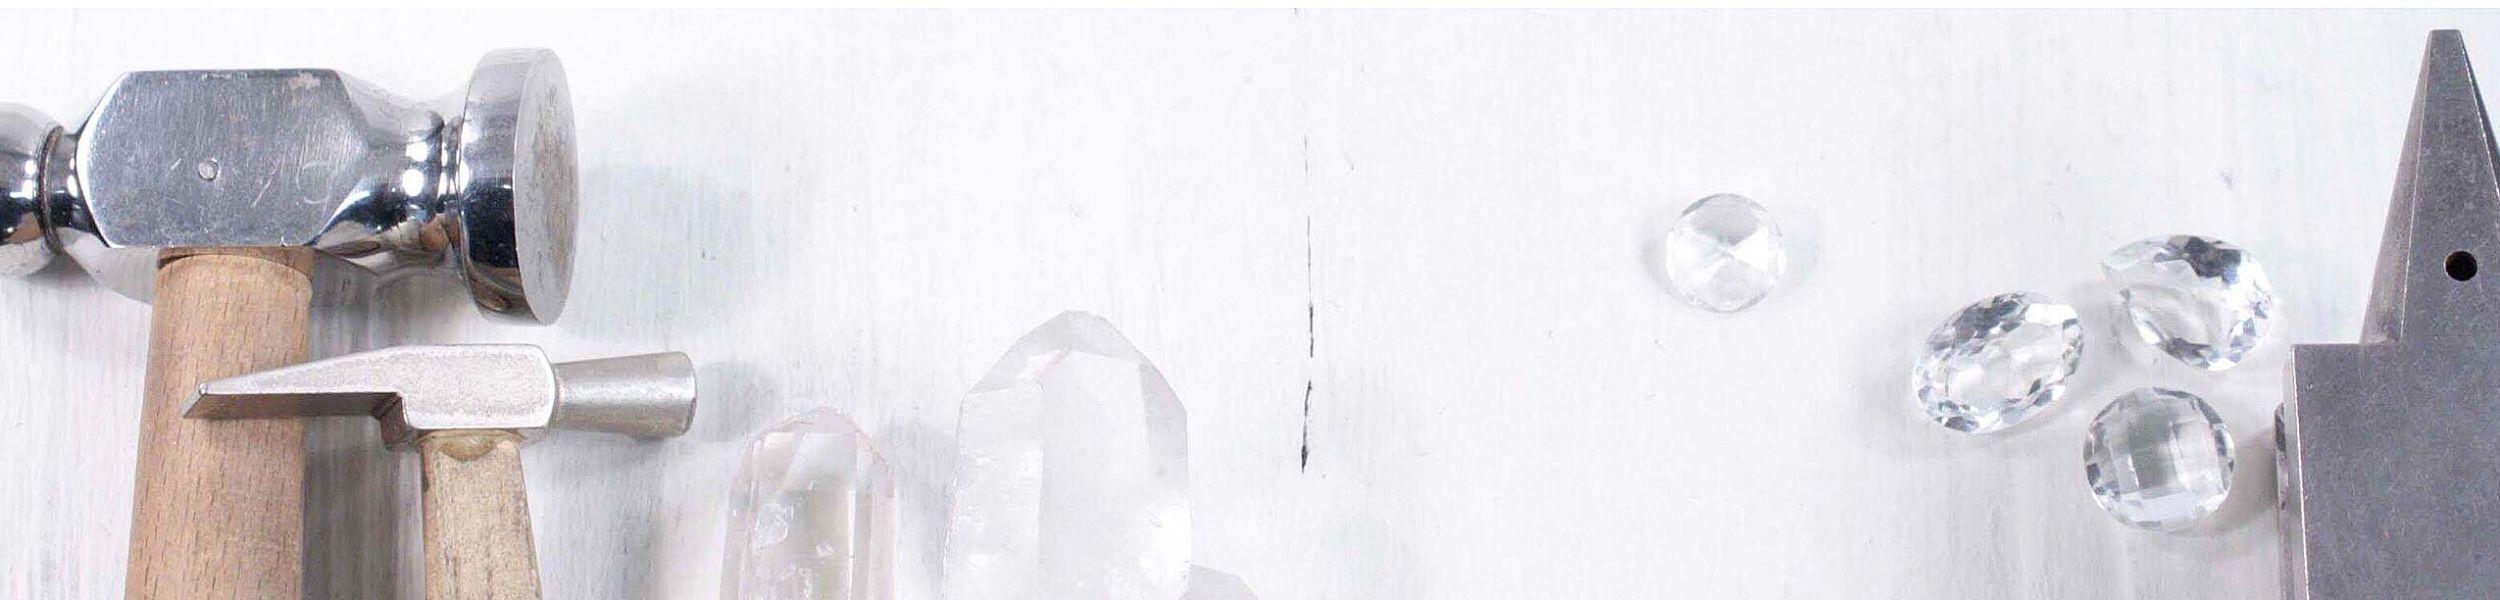 marcela-kolczyki-srebrne-pracownia